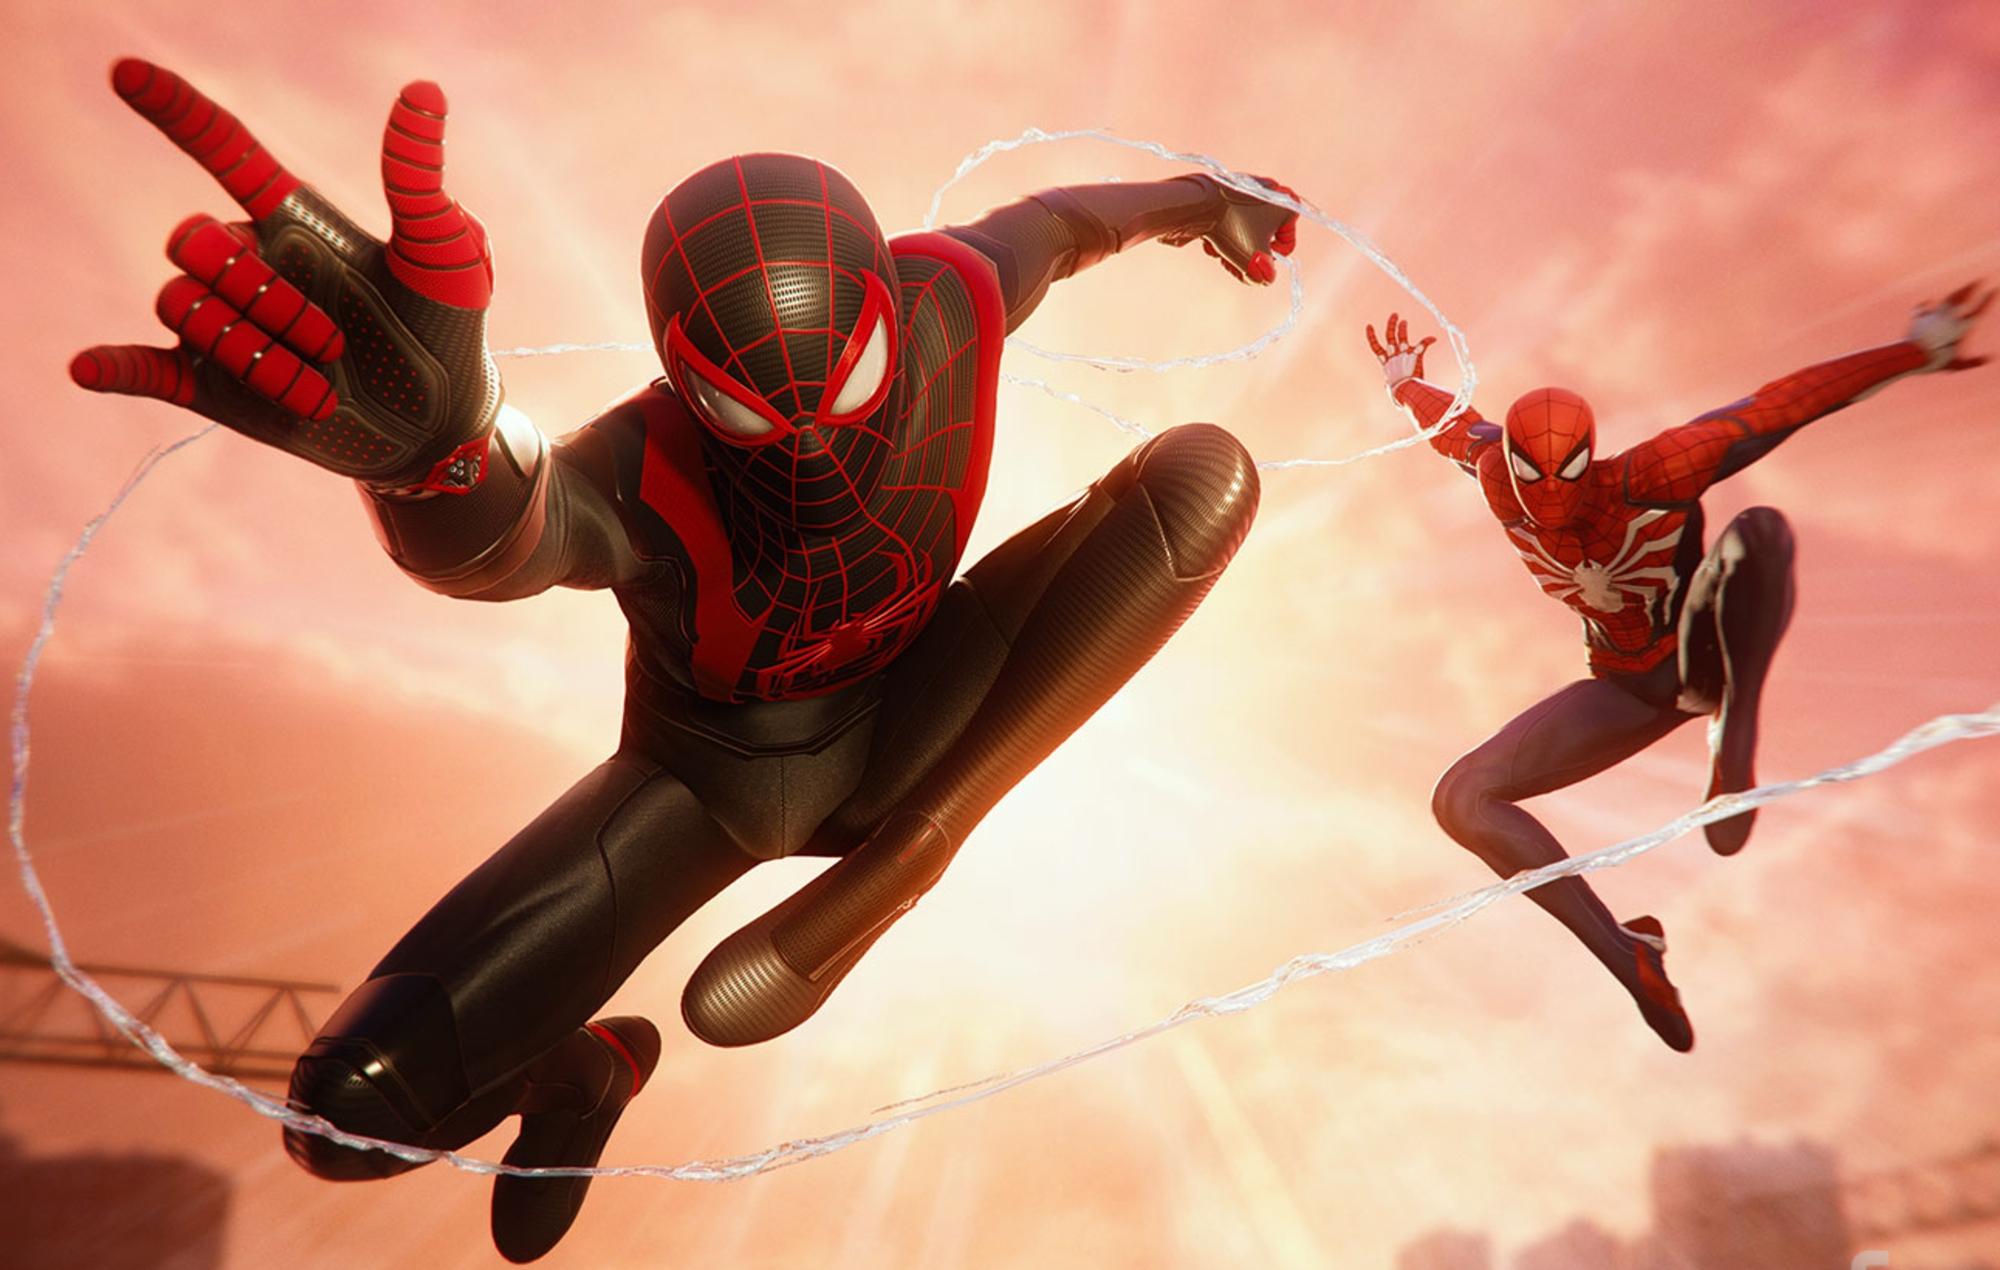 Sony v roce 2020 prodala 4,5 miliónů konzolí PlayStation 5 Miles